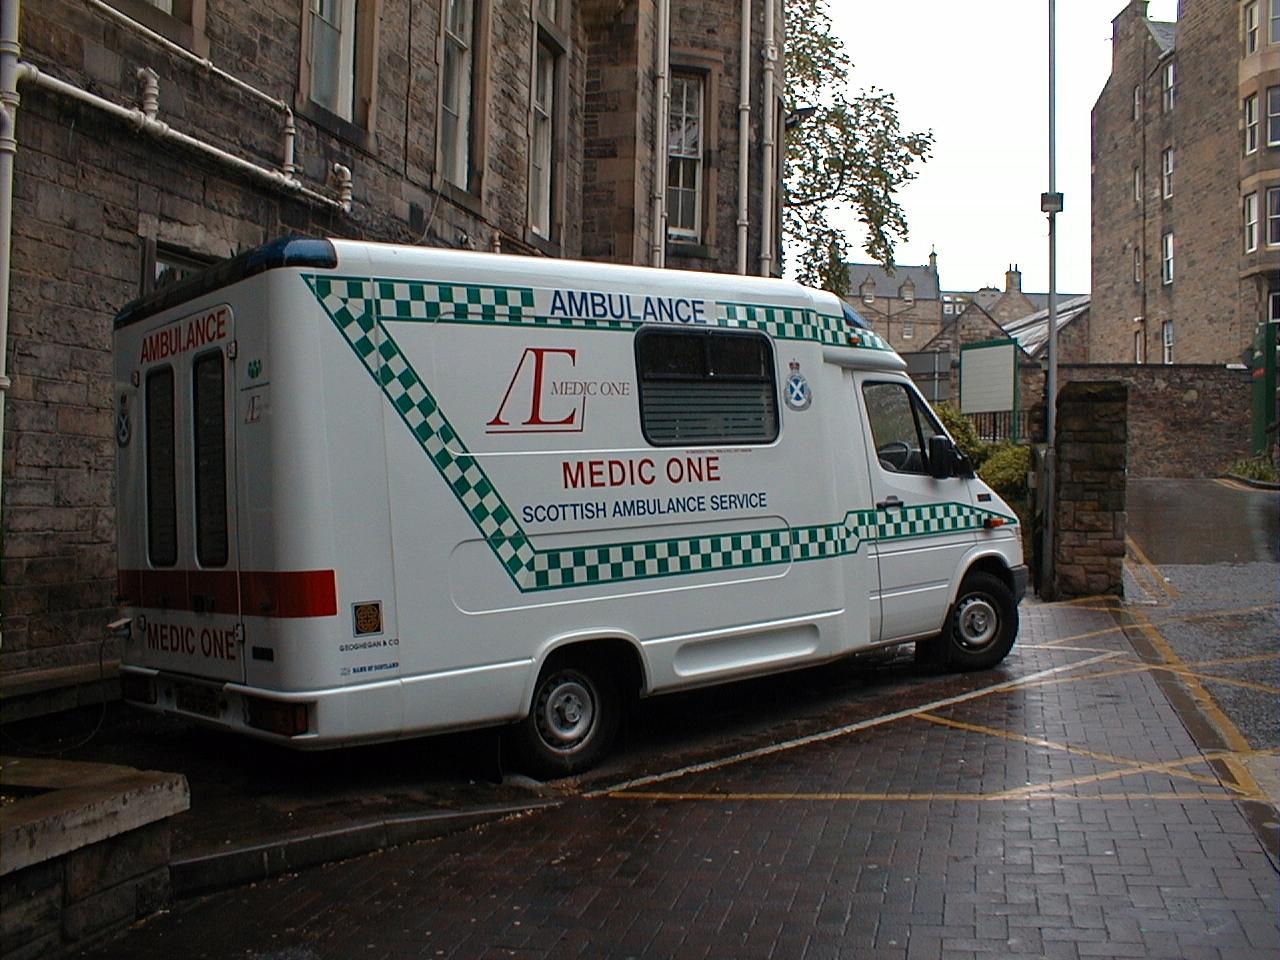 EdinburghEmergencyMedicine-MedicOne004.JPG